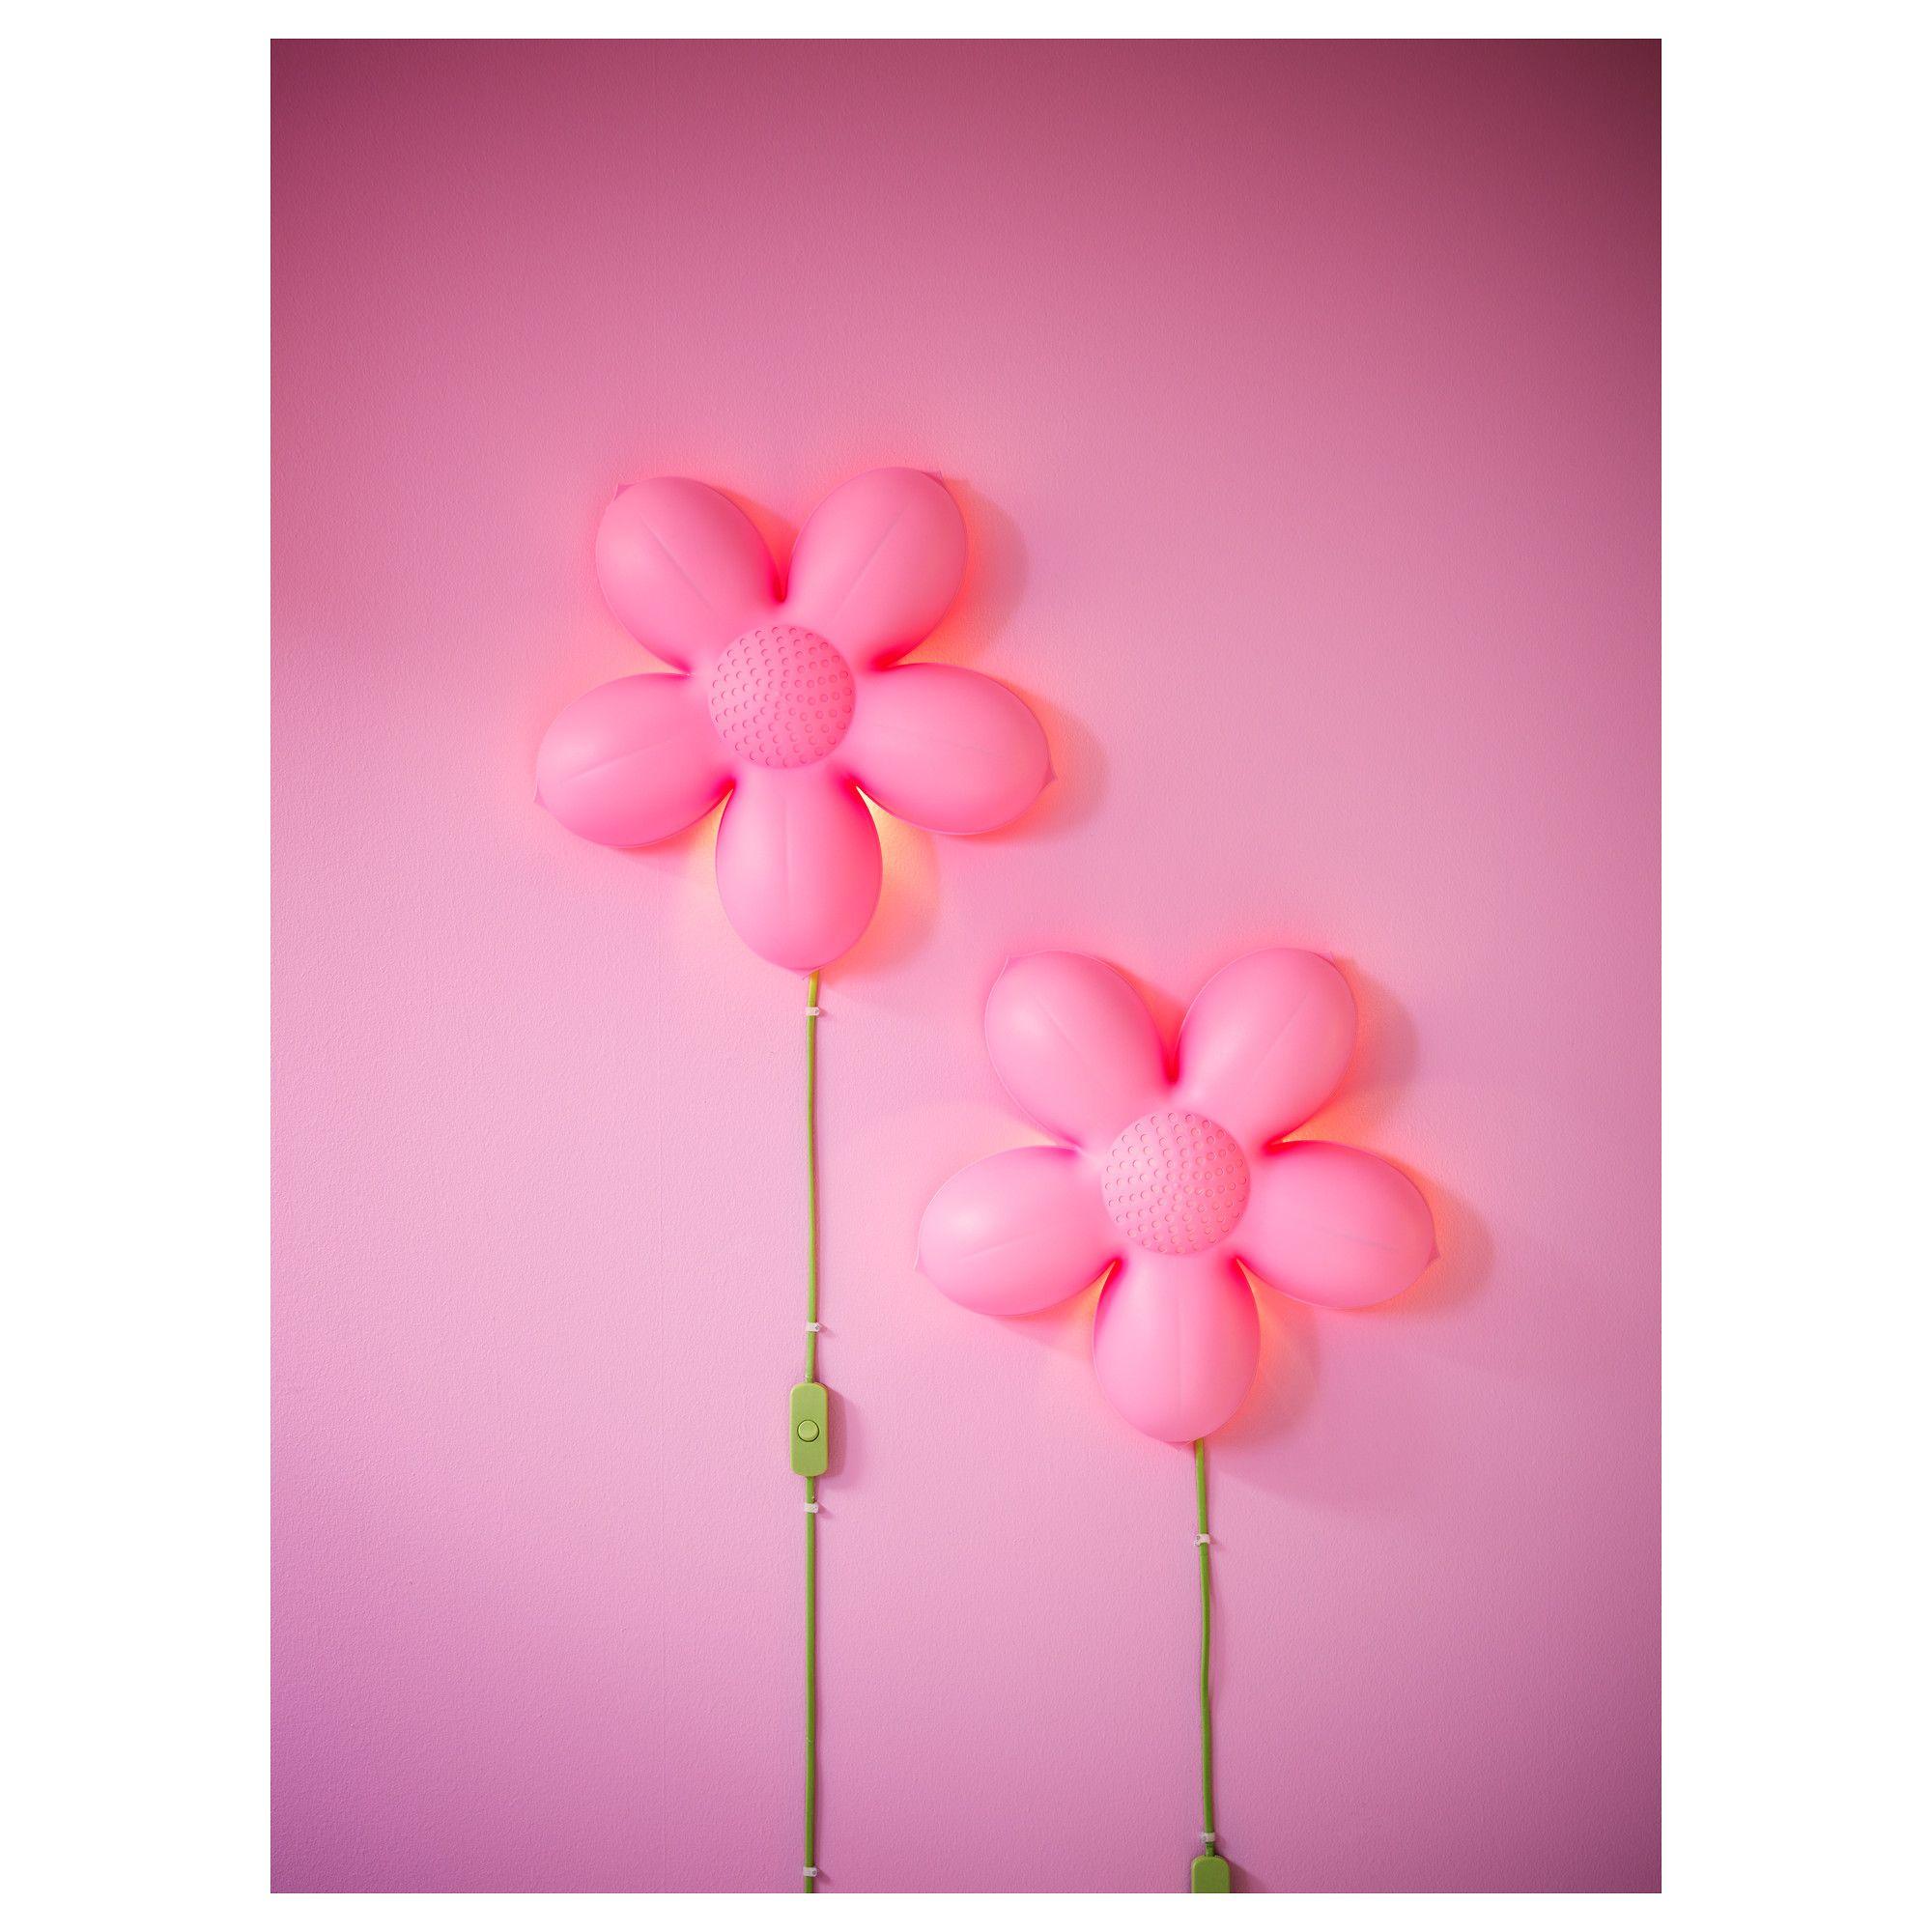 SMILA BLOMMA Απλίκα IKEA Home Pinterest Kids Rooms Walls - Flower lights for bedroom